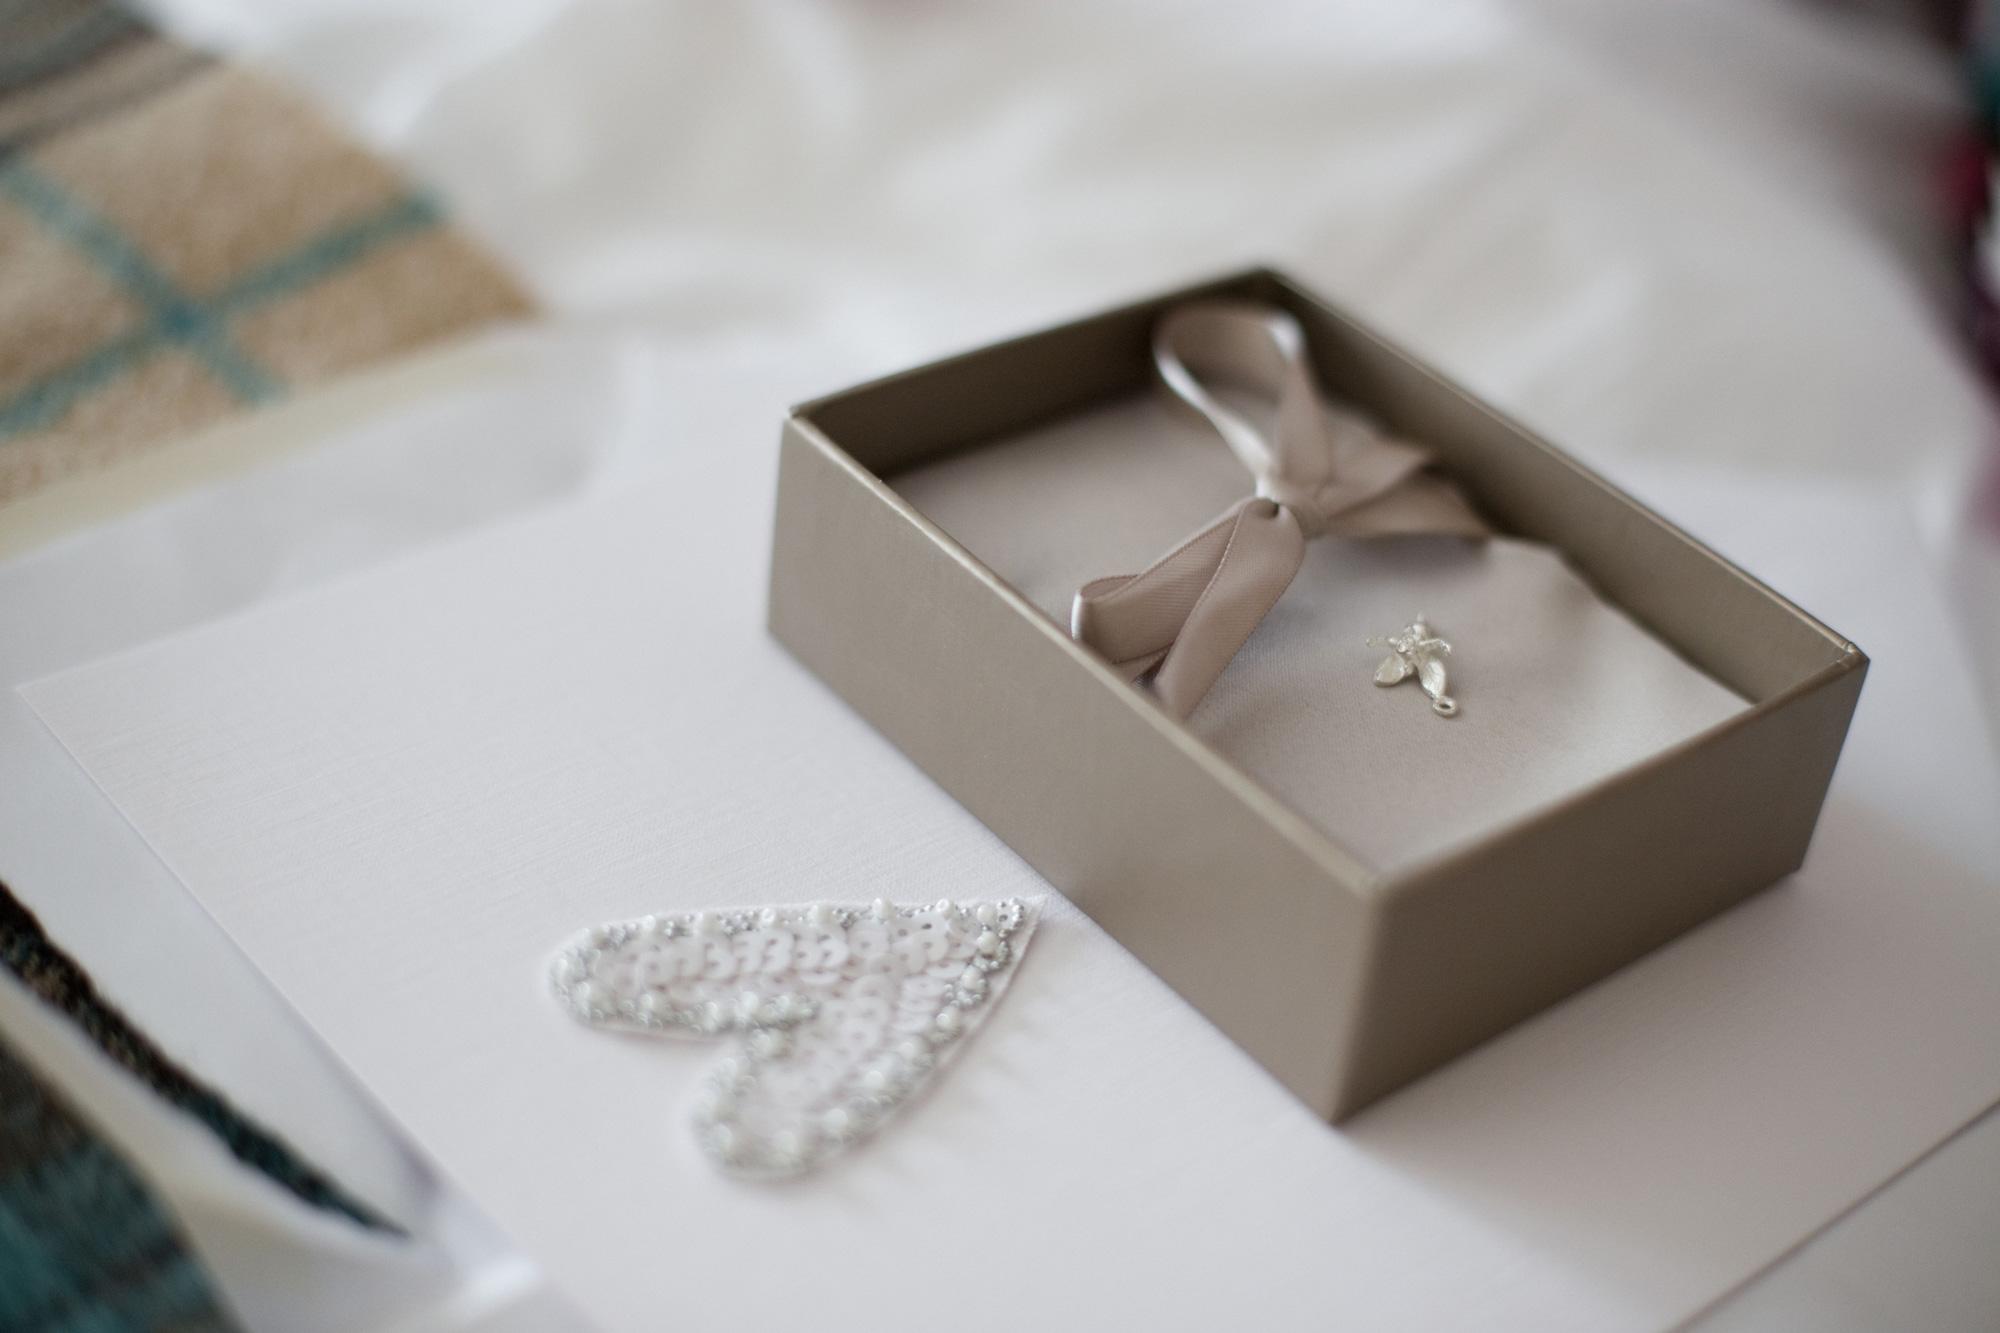 Bridal wedding gift